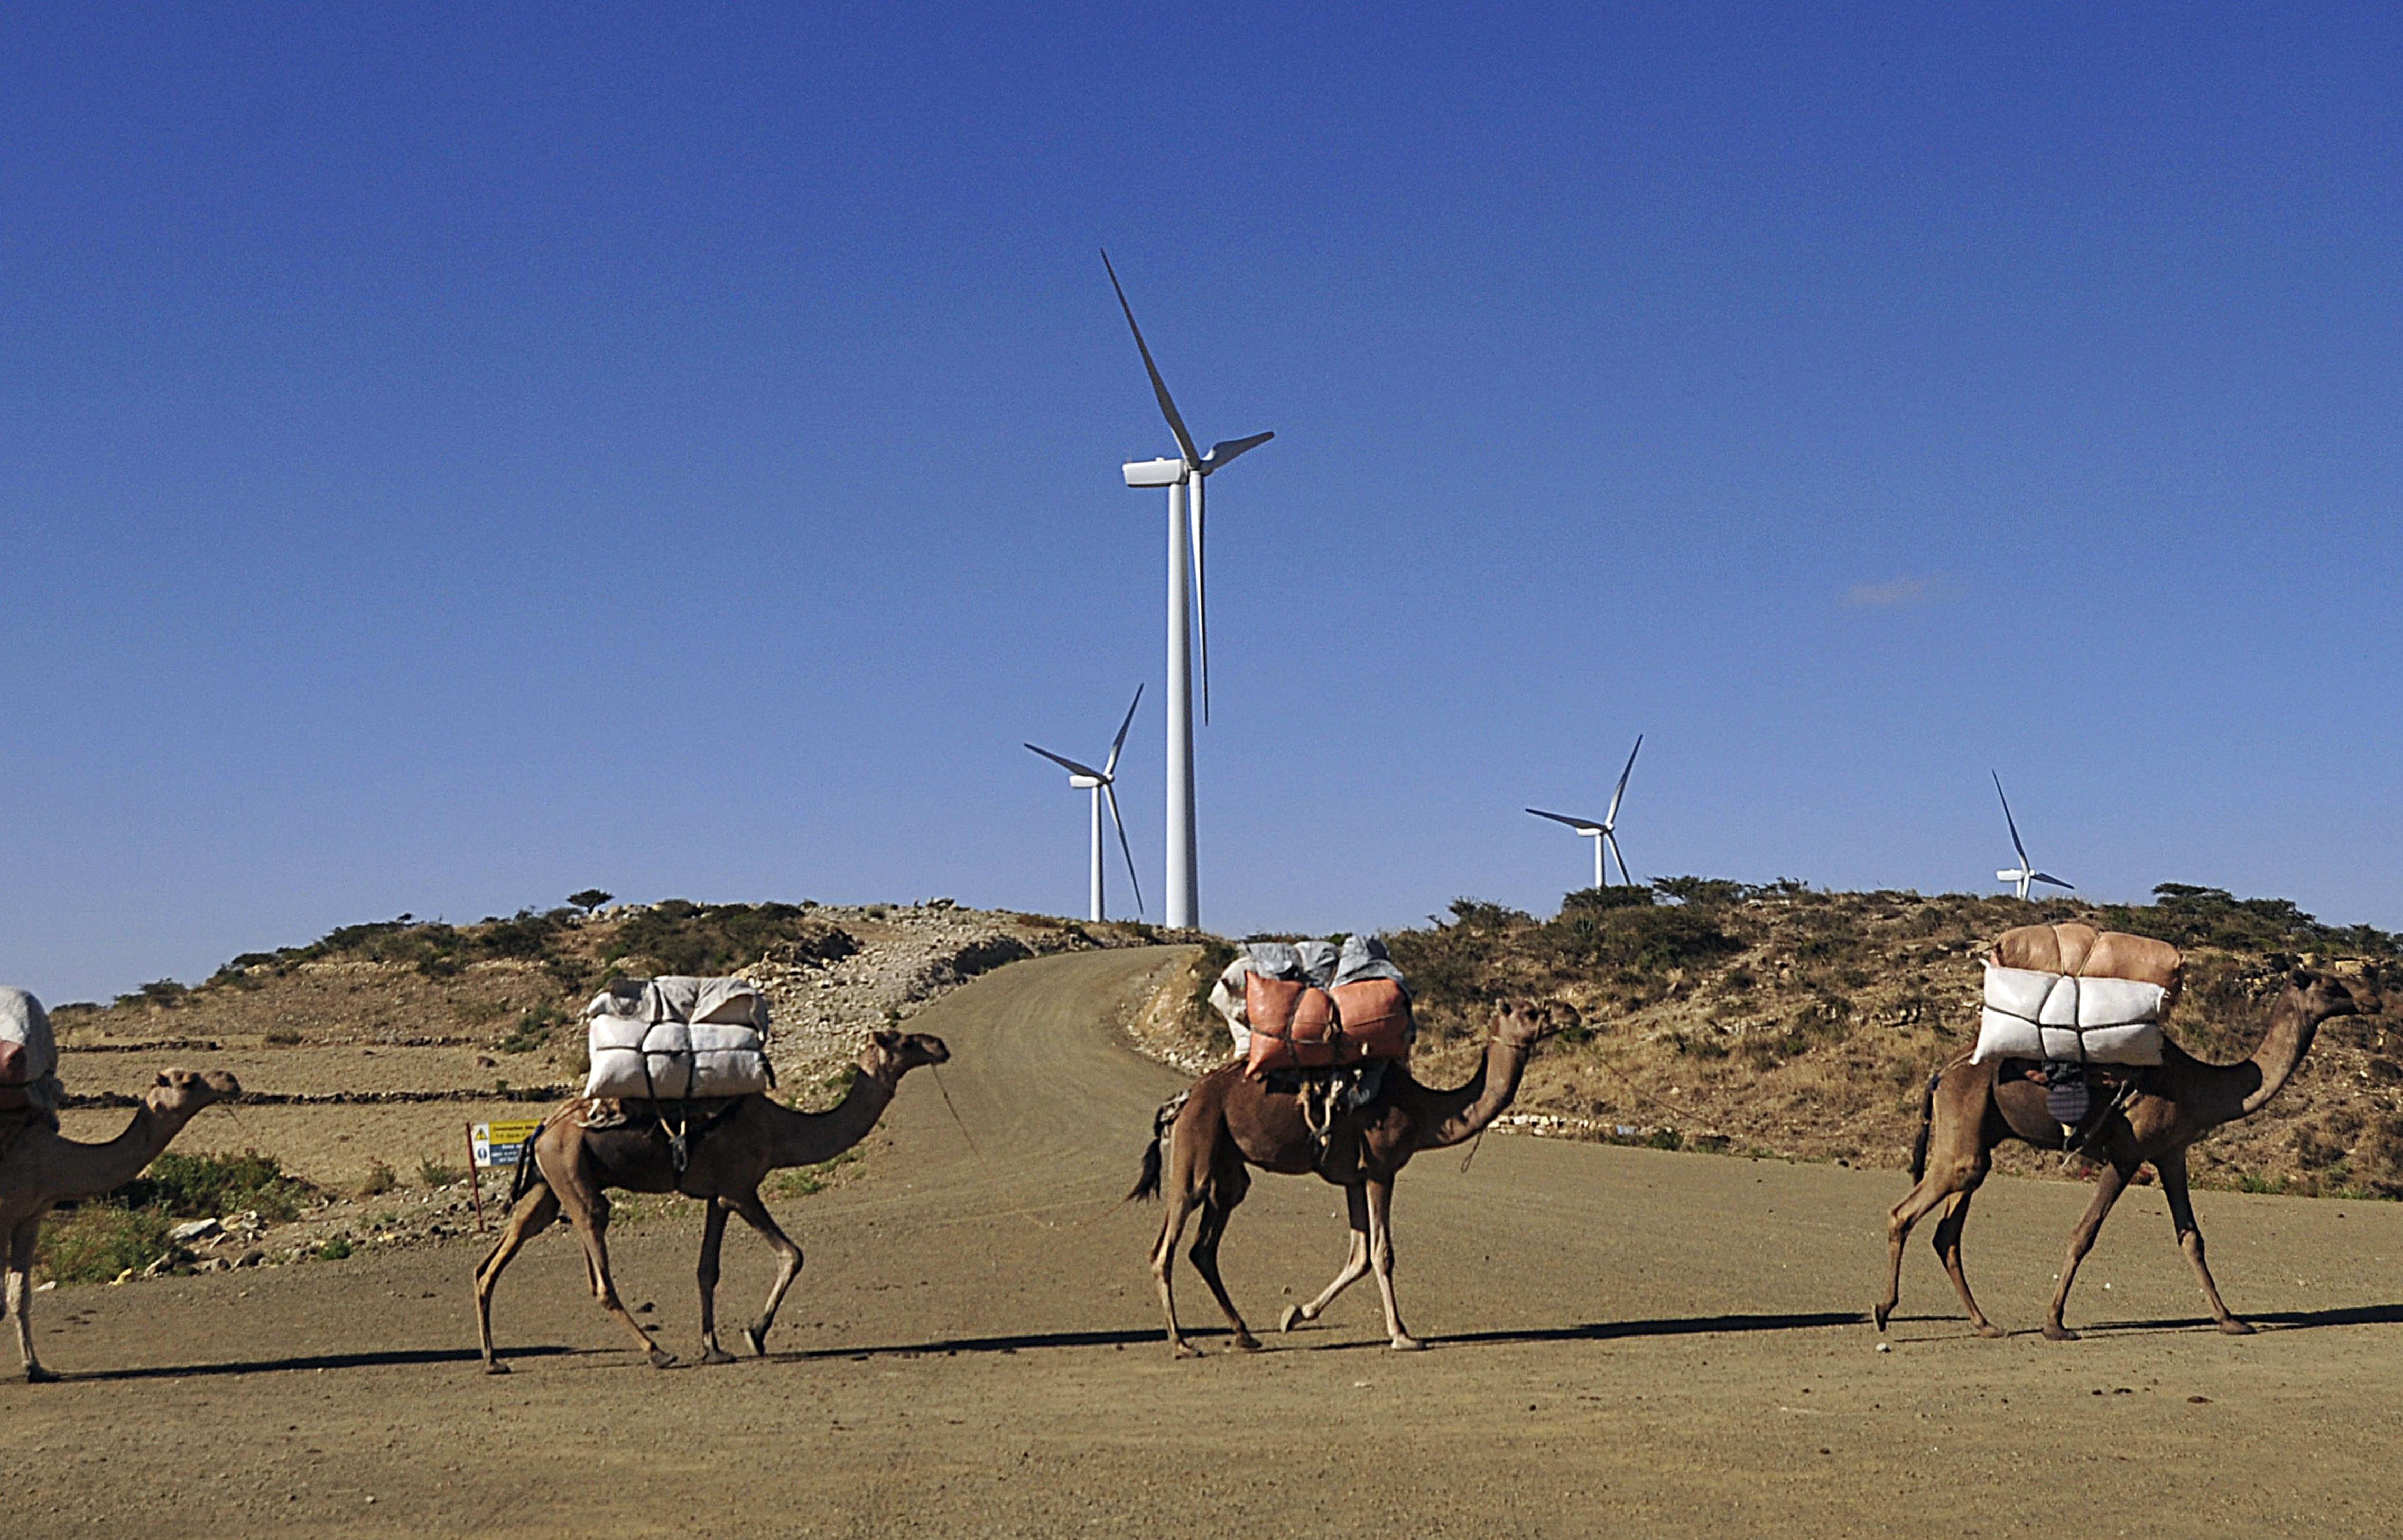 ETHIOPIA-ENERGY-WINDFARM